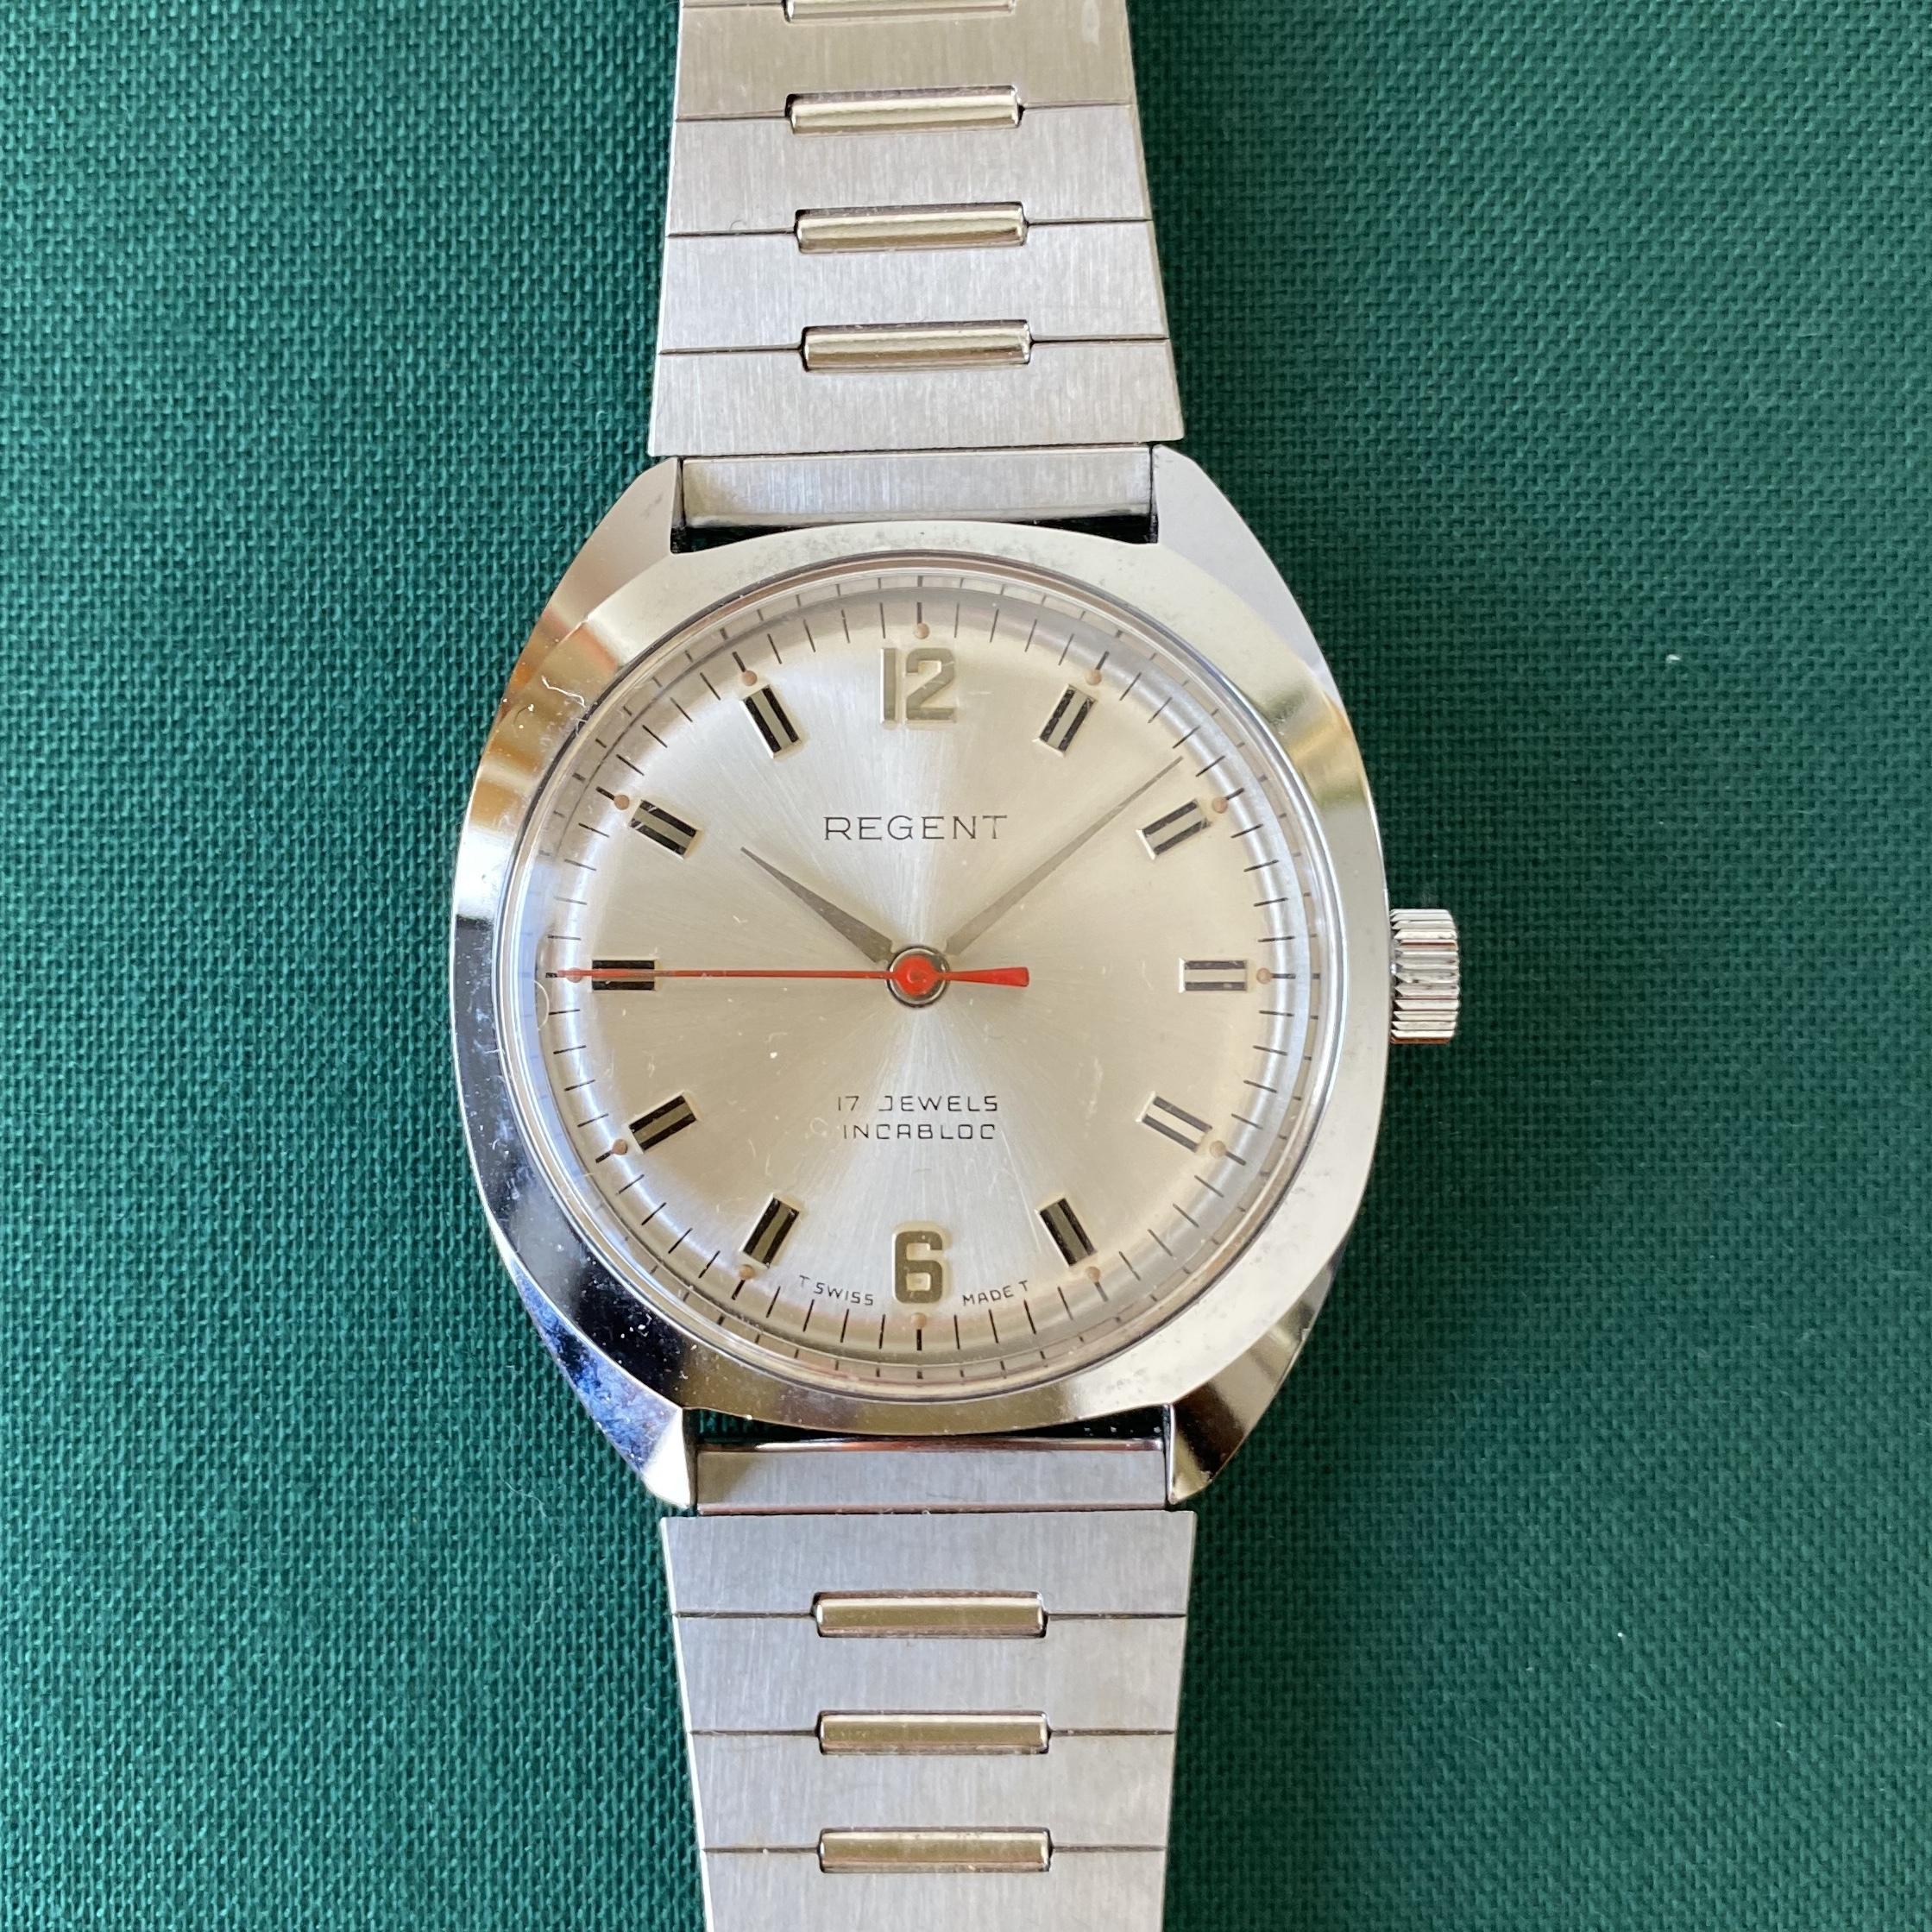 Swiss1960年代手巻き式腕時計(シルバー・ラウンド) / ac0046